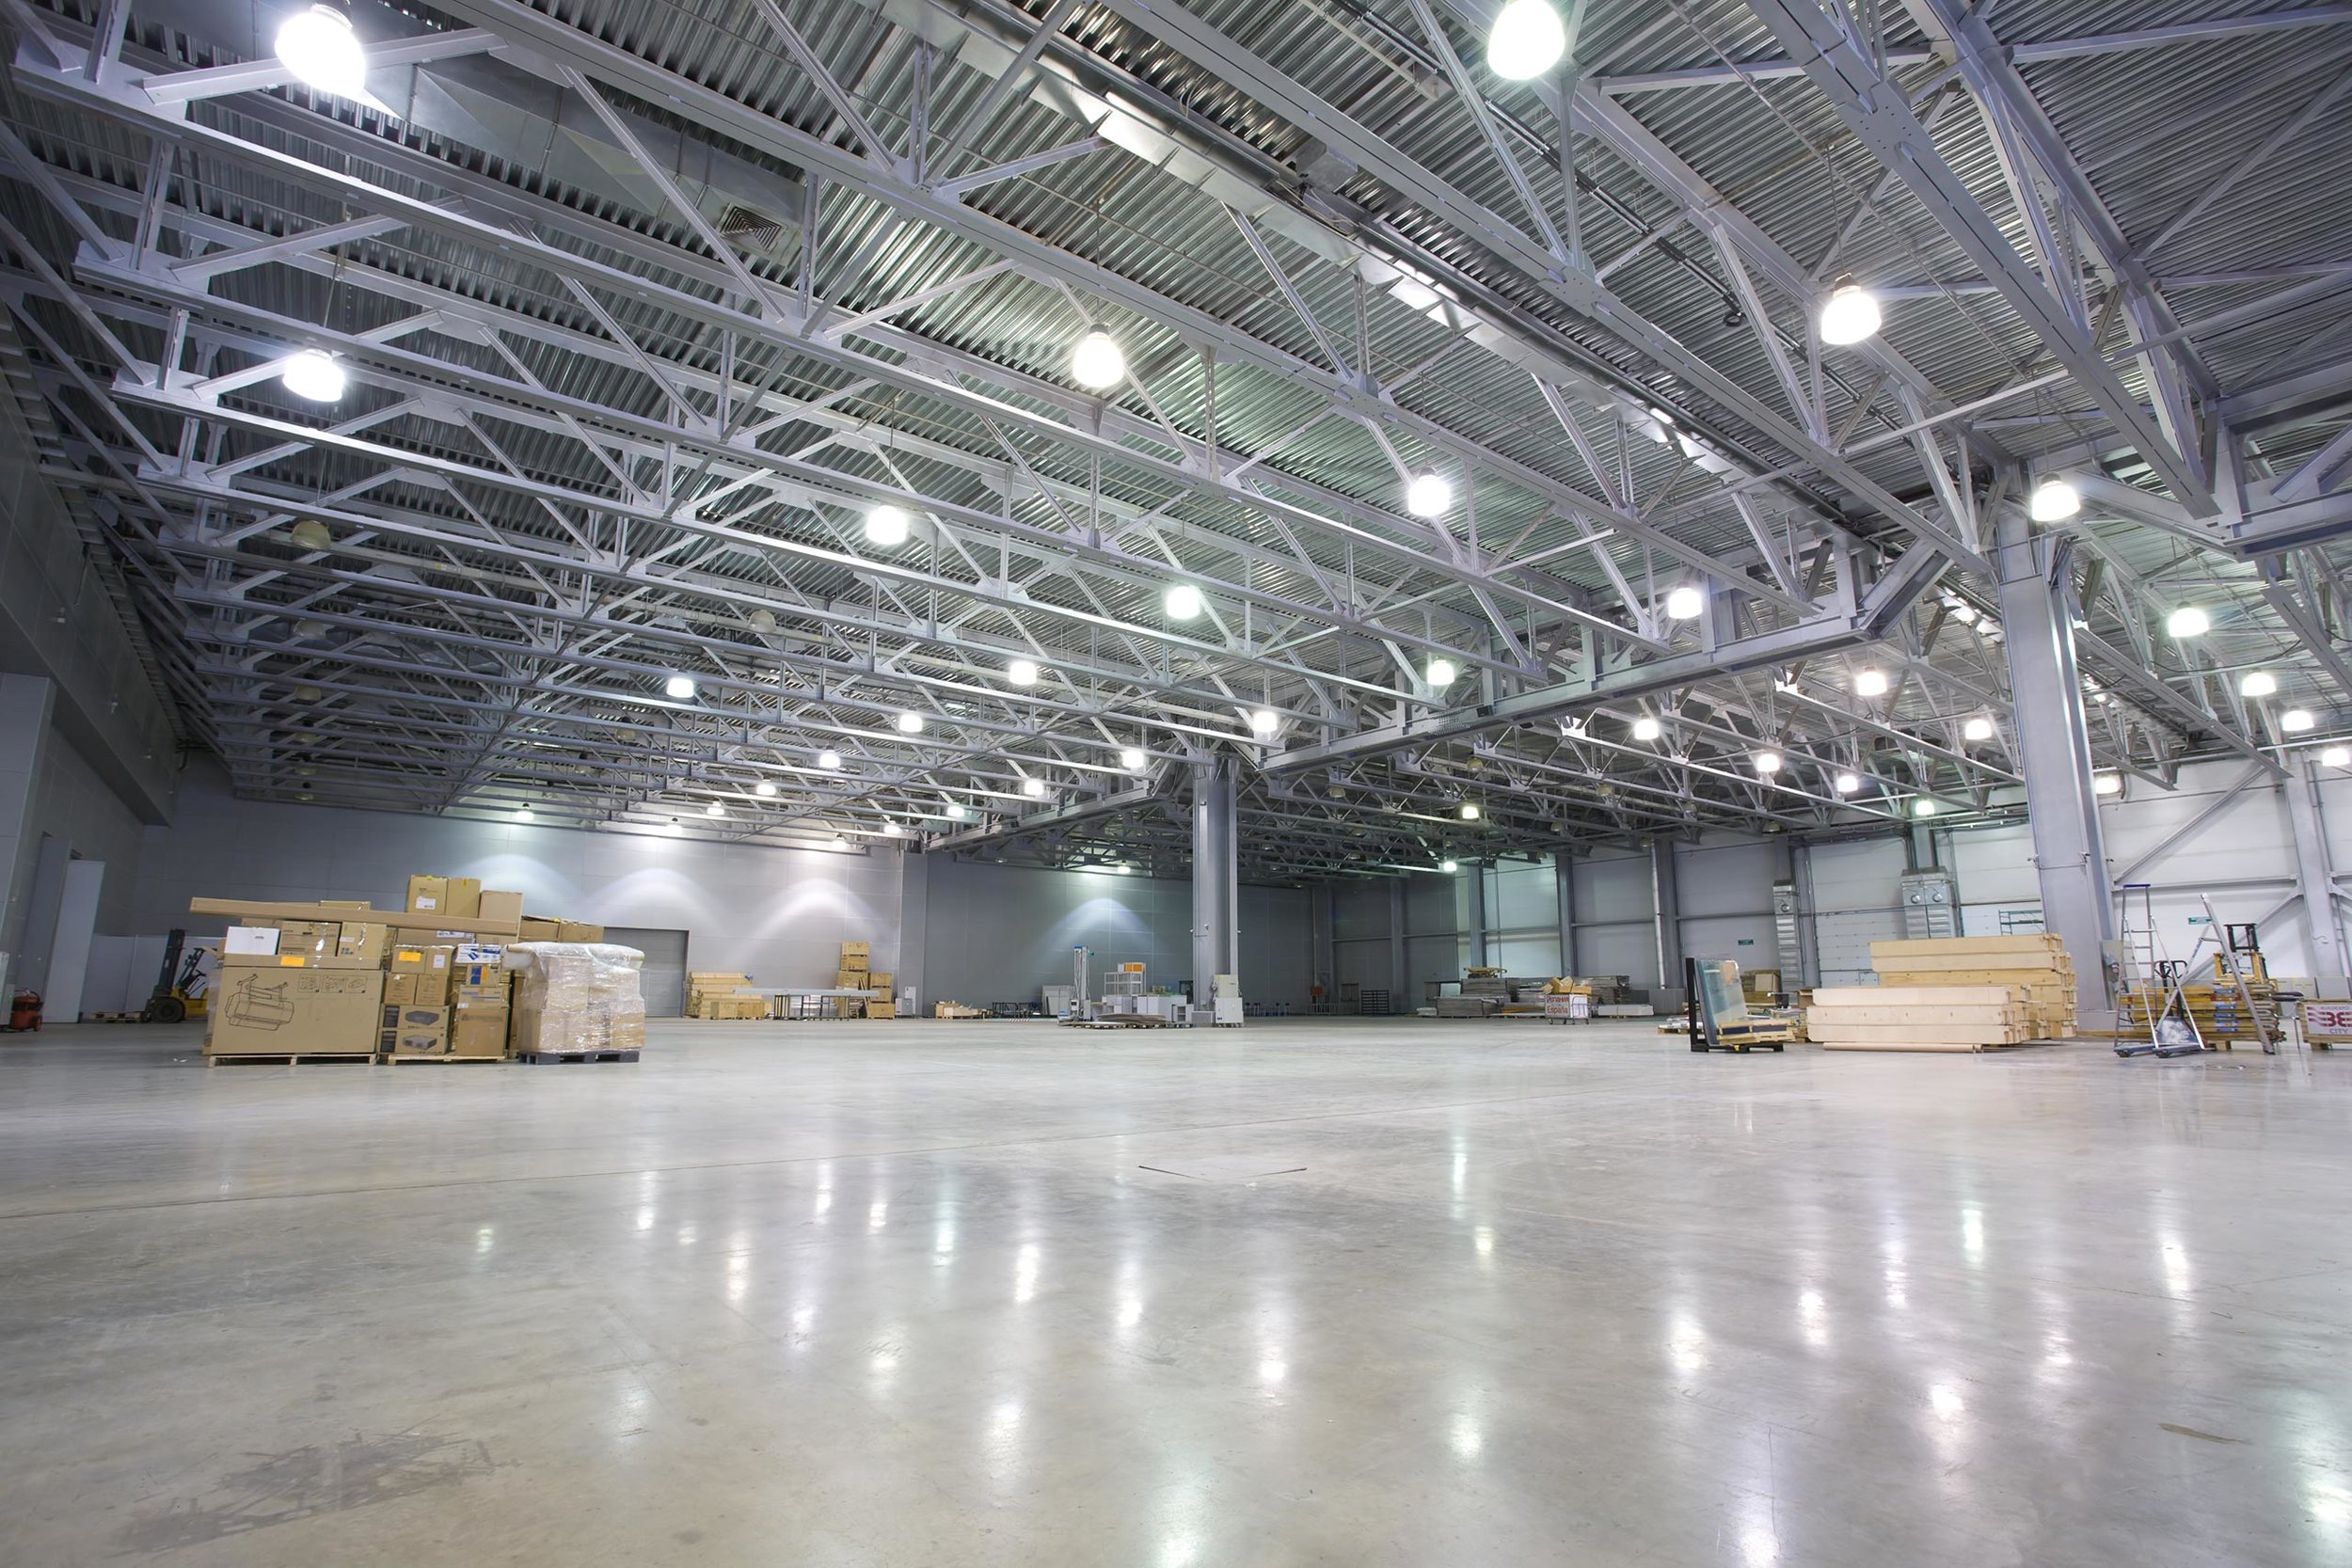 envirolux-led-warehouse-lighting-homepage.jpg